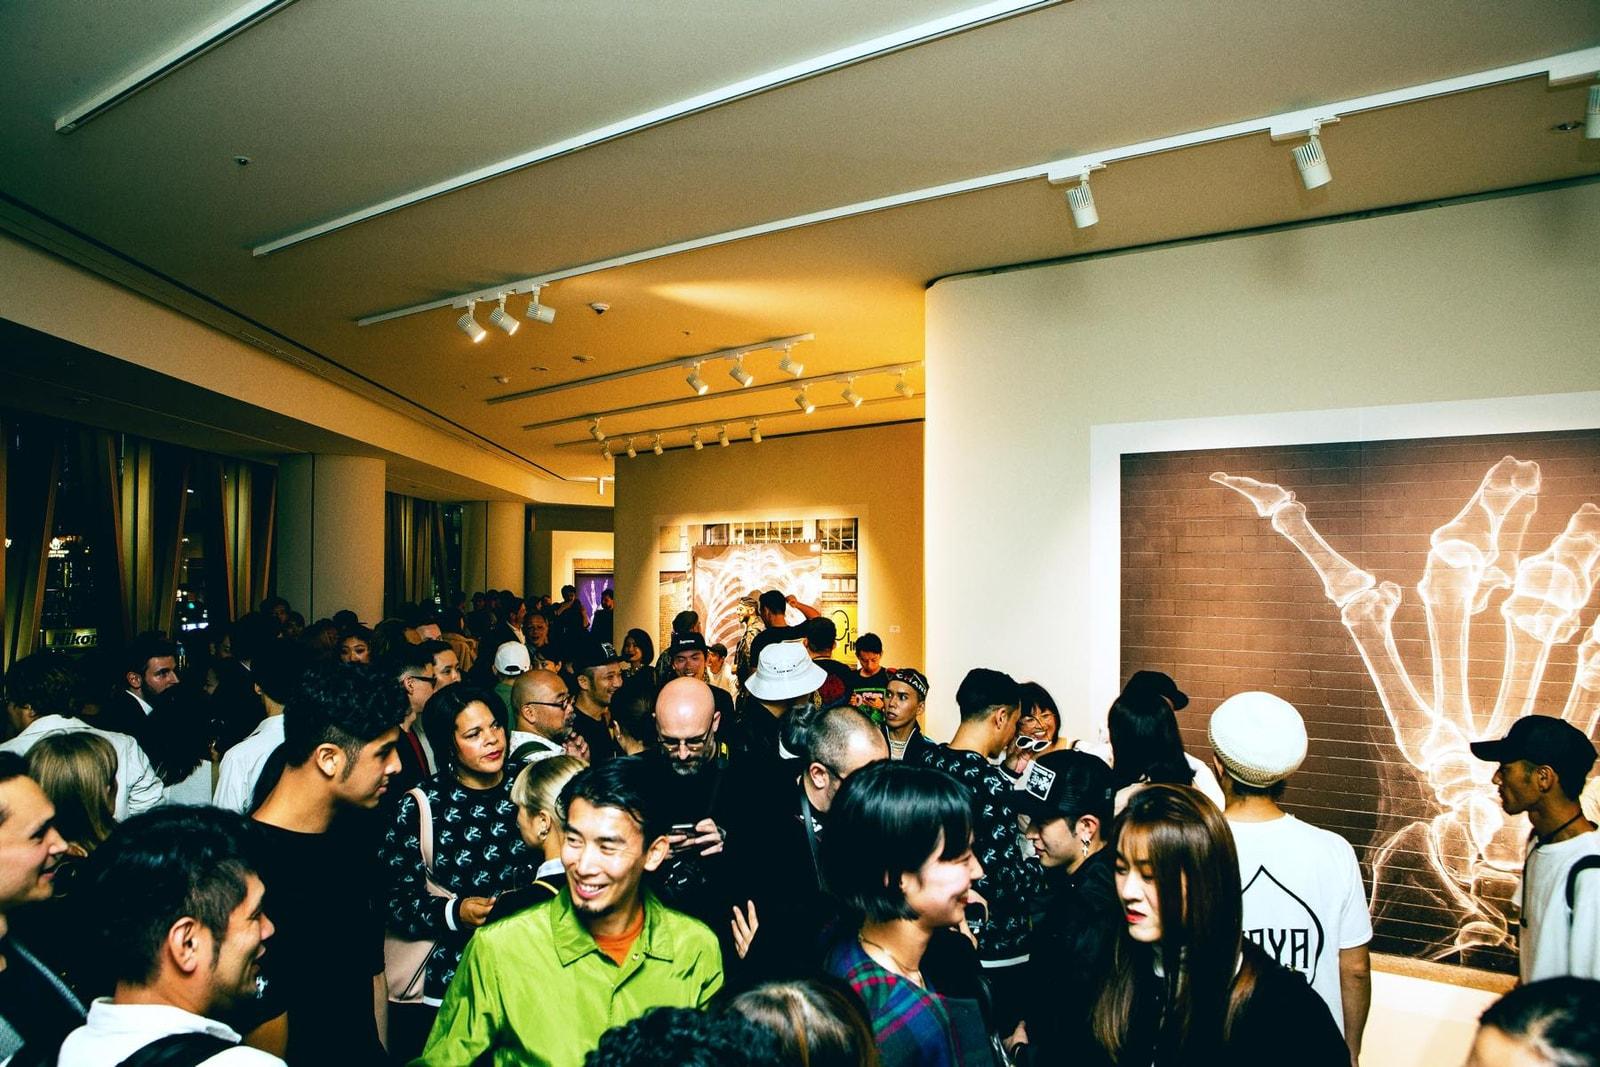 BALLY x Swizz Beatz x SHOK-1の豪華コラボによる一夜限りのレセプションとナイトイベントに潜入 ストリートの歴史を更新する〈BALLY〉の東京プロジェクトをフォトレポート